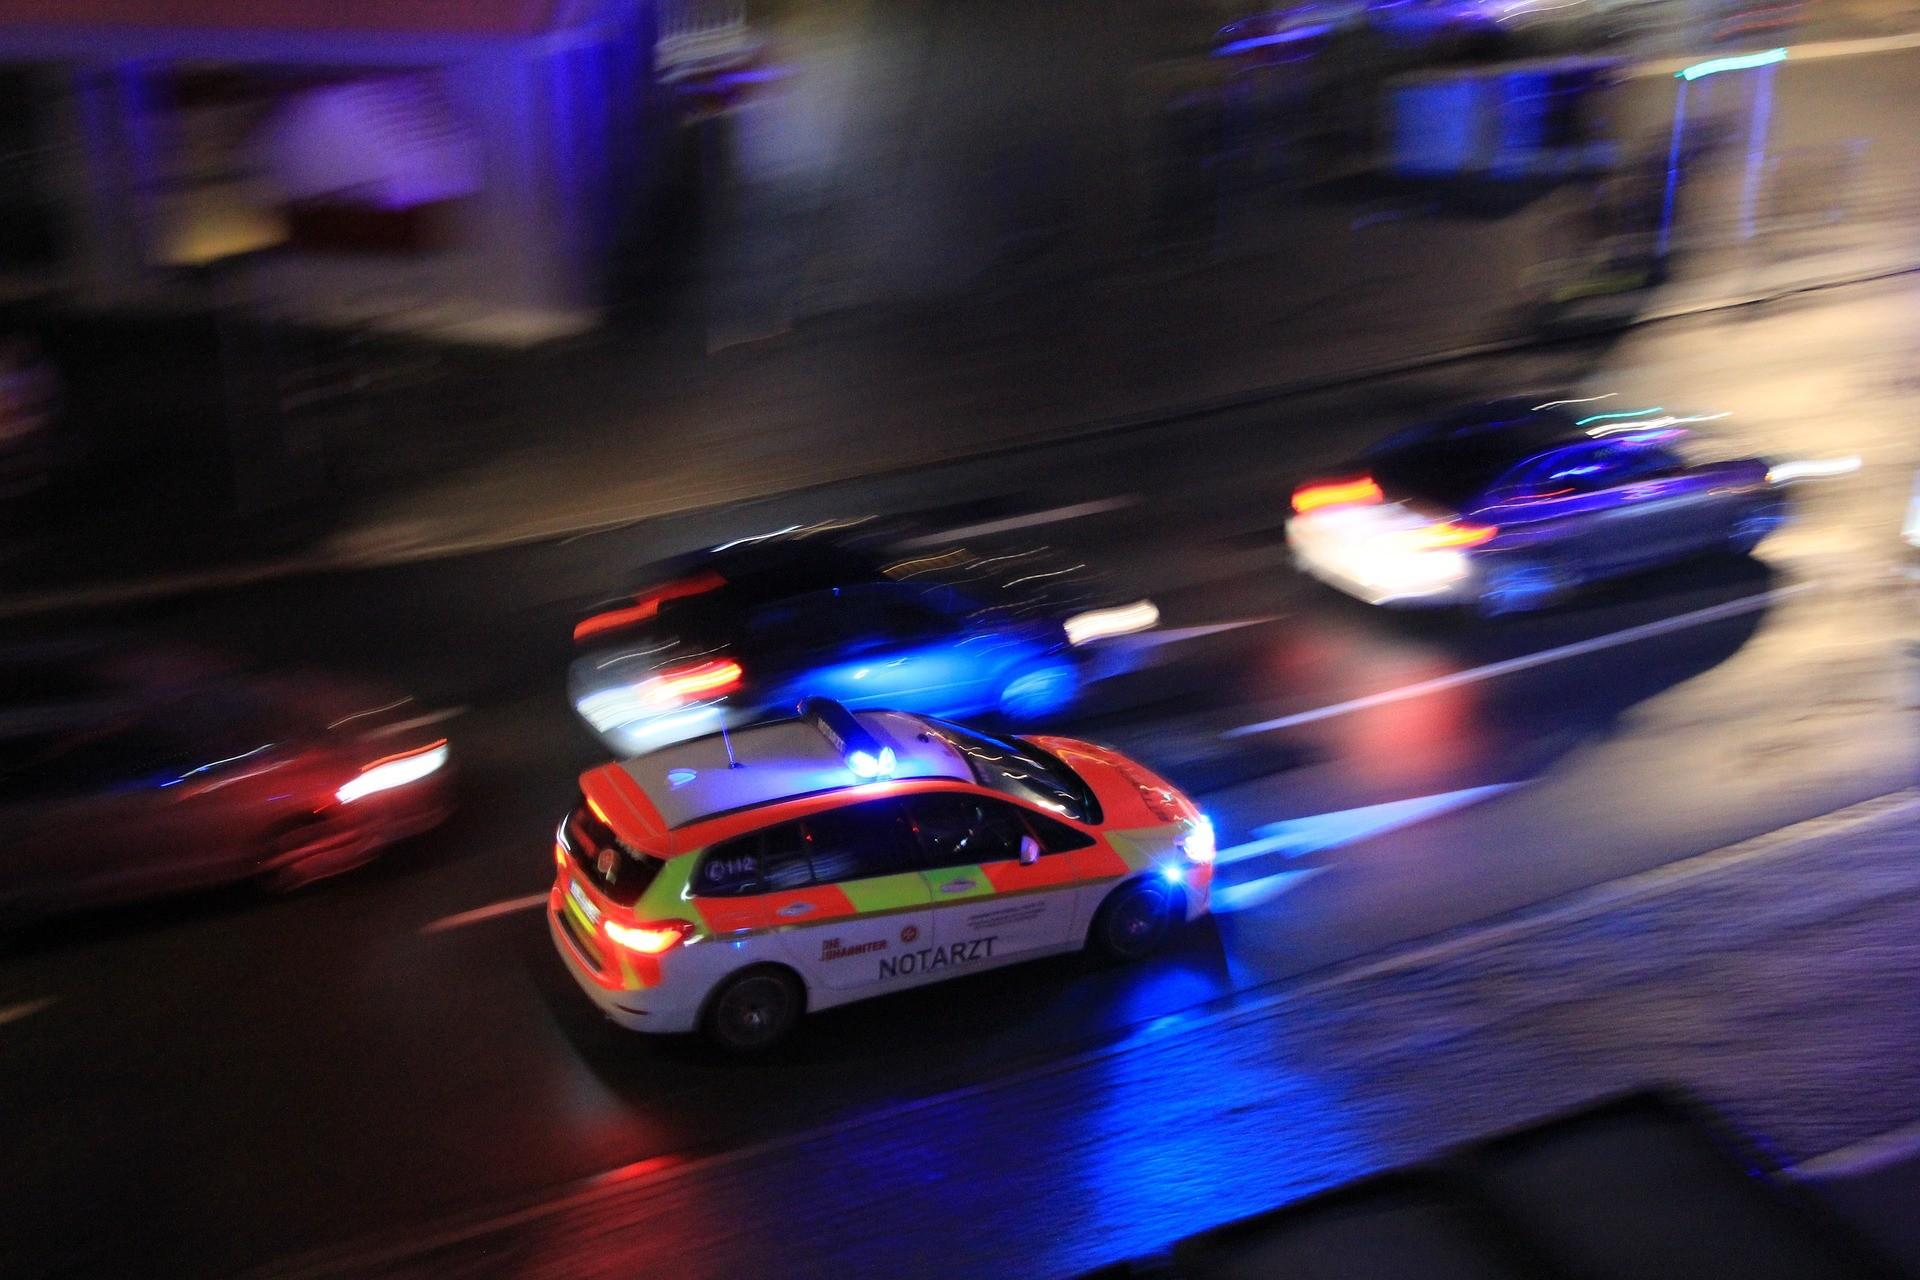 vehículo emergencia tráfico